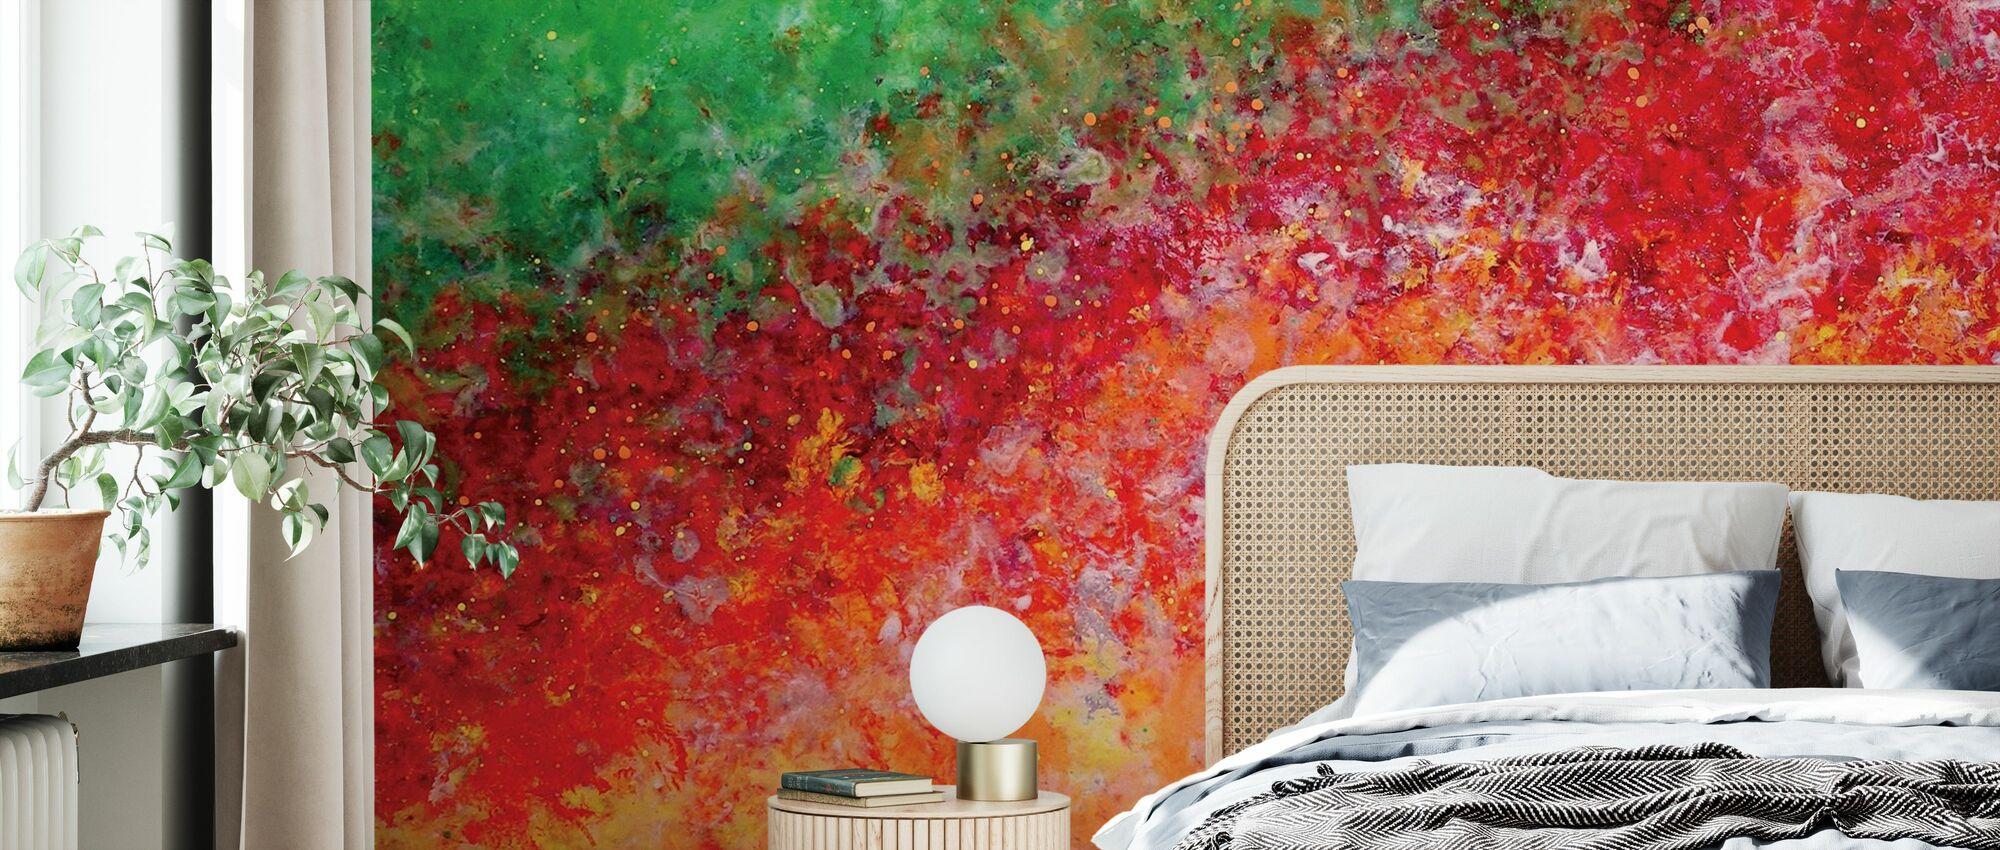 Breath of Life - Wallpaper - Bedroom